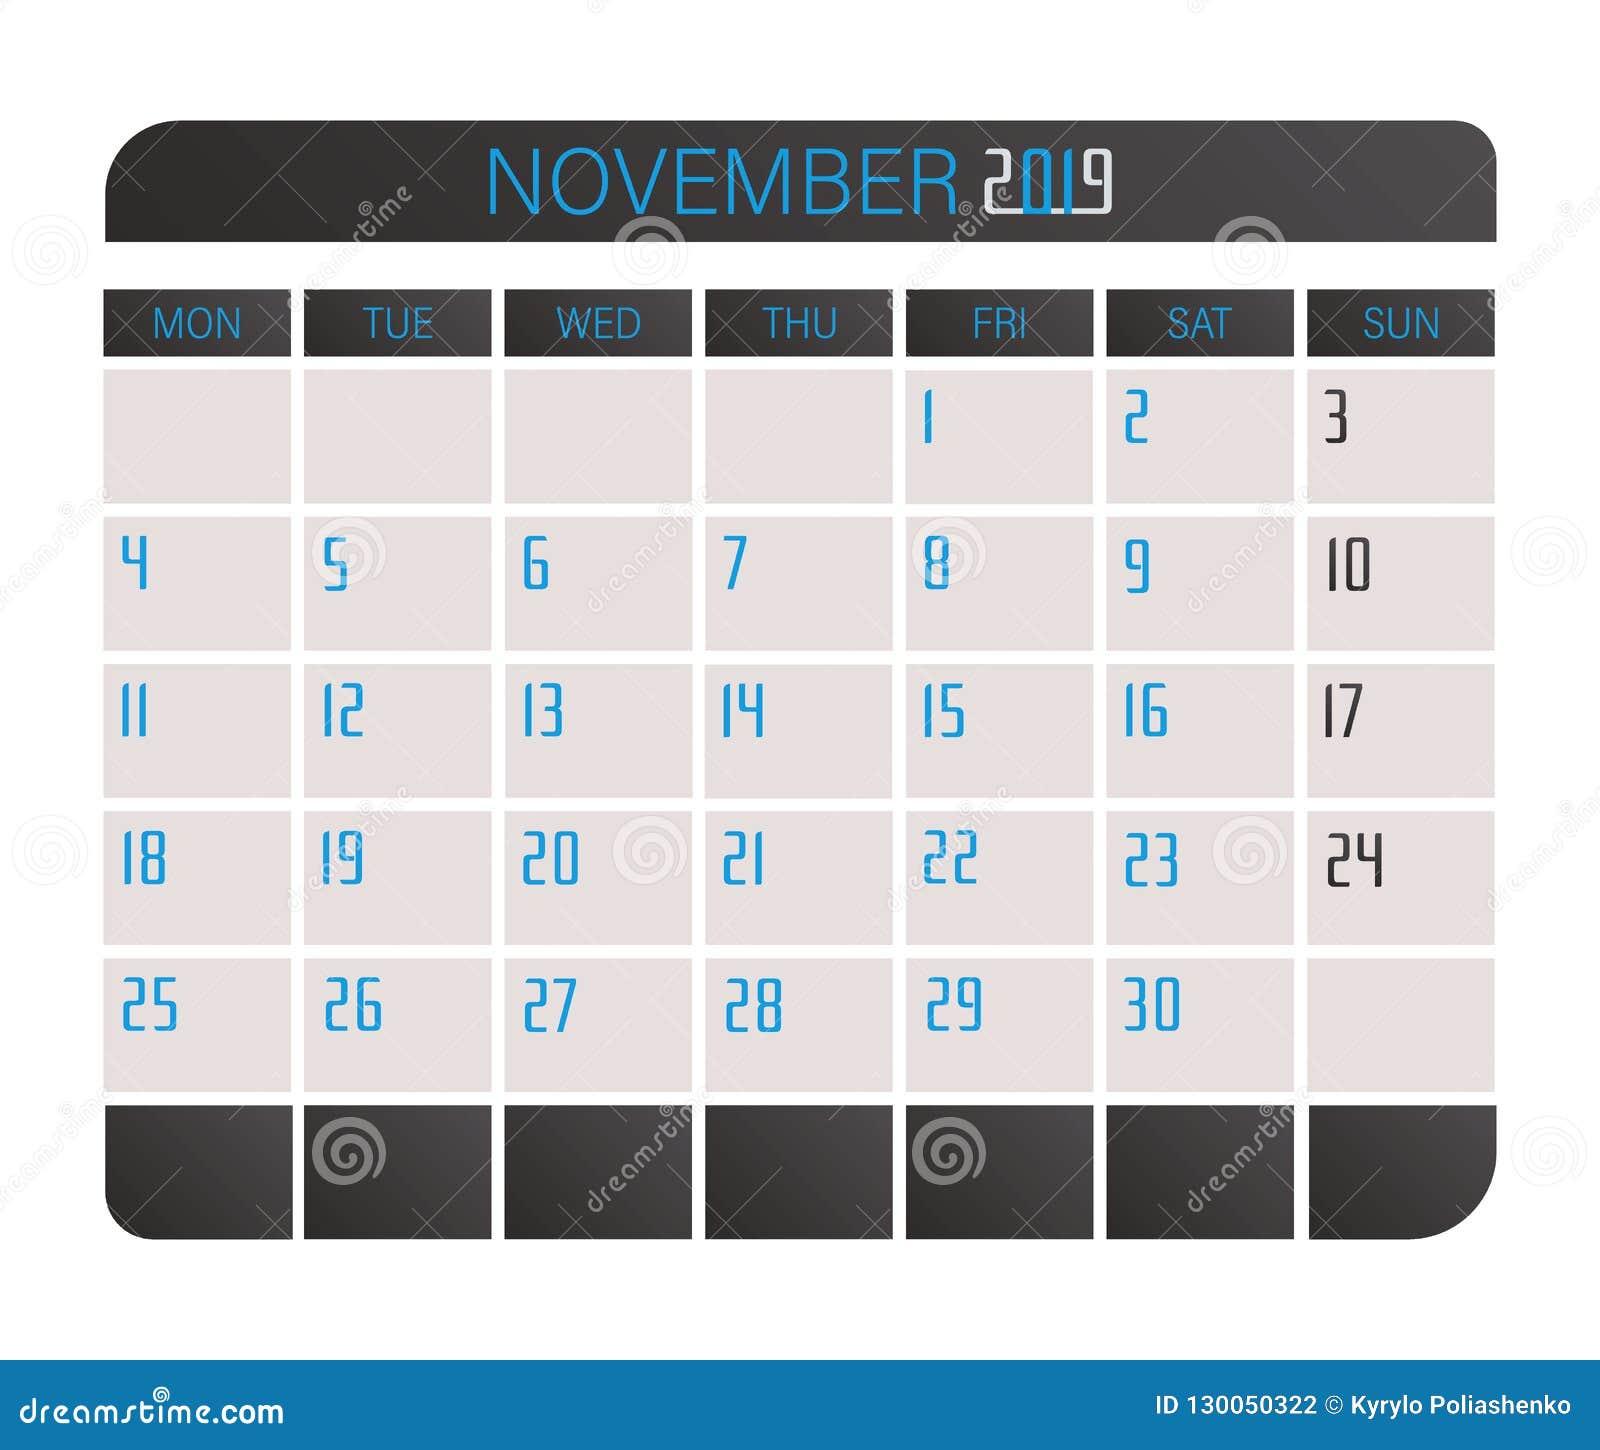 November 2017 kalender